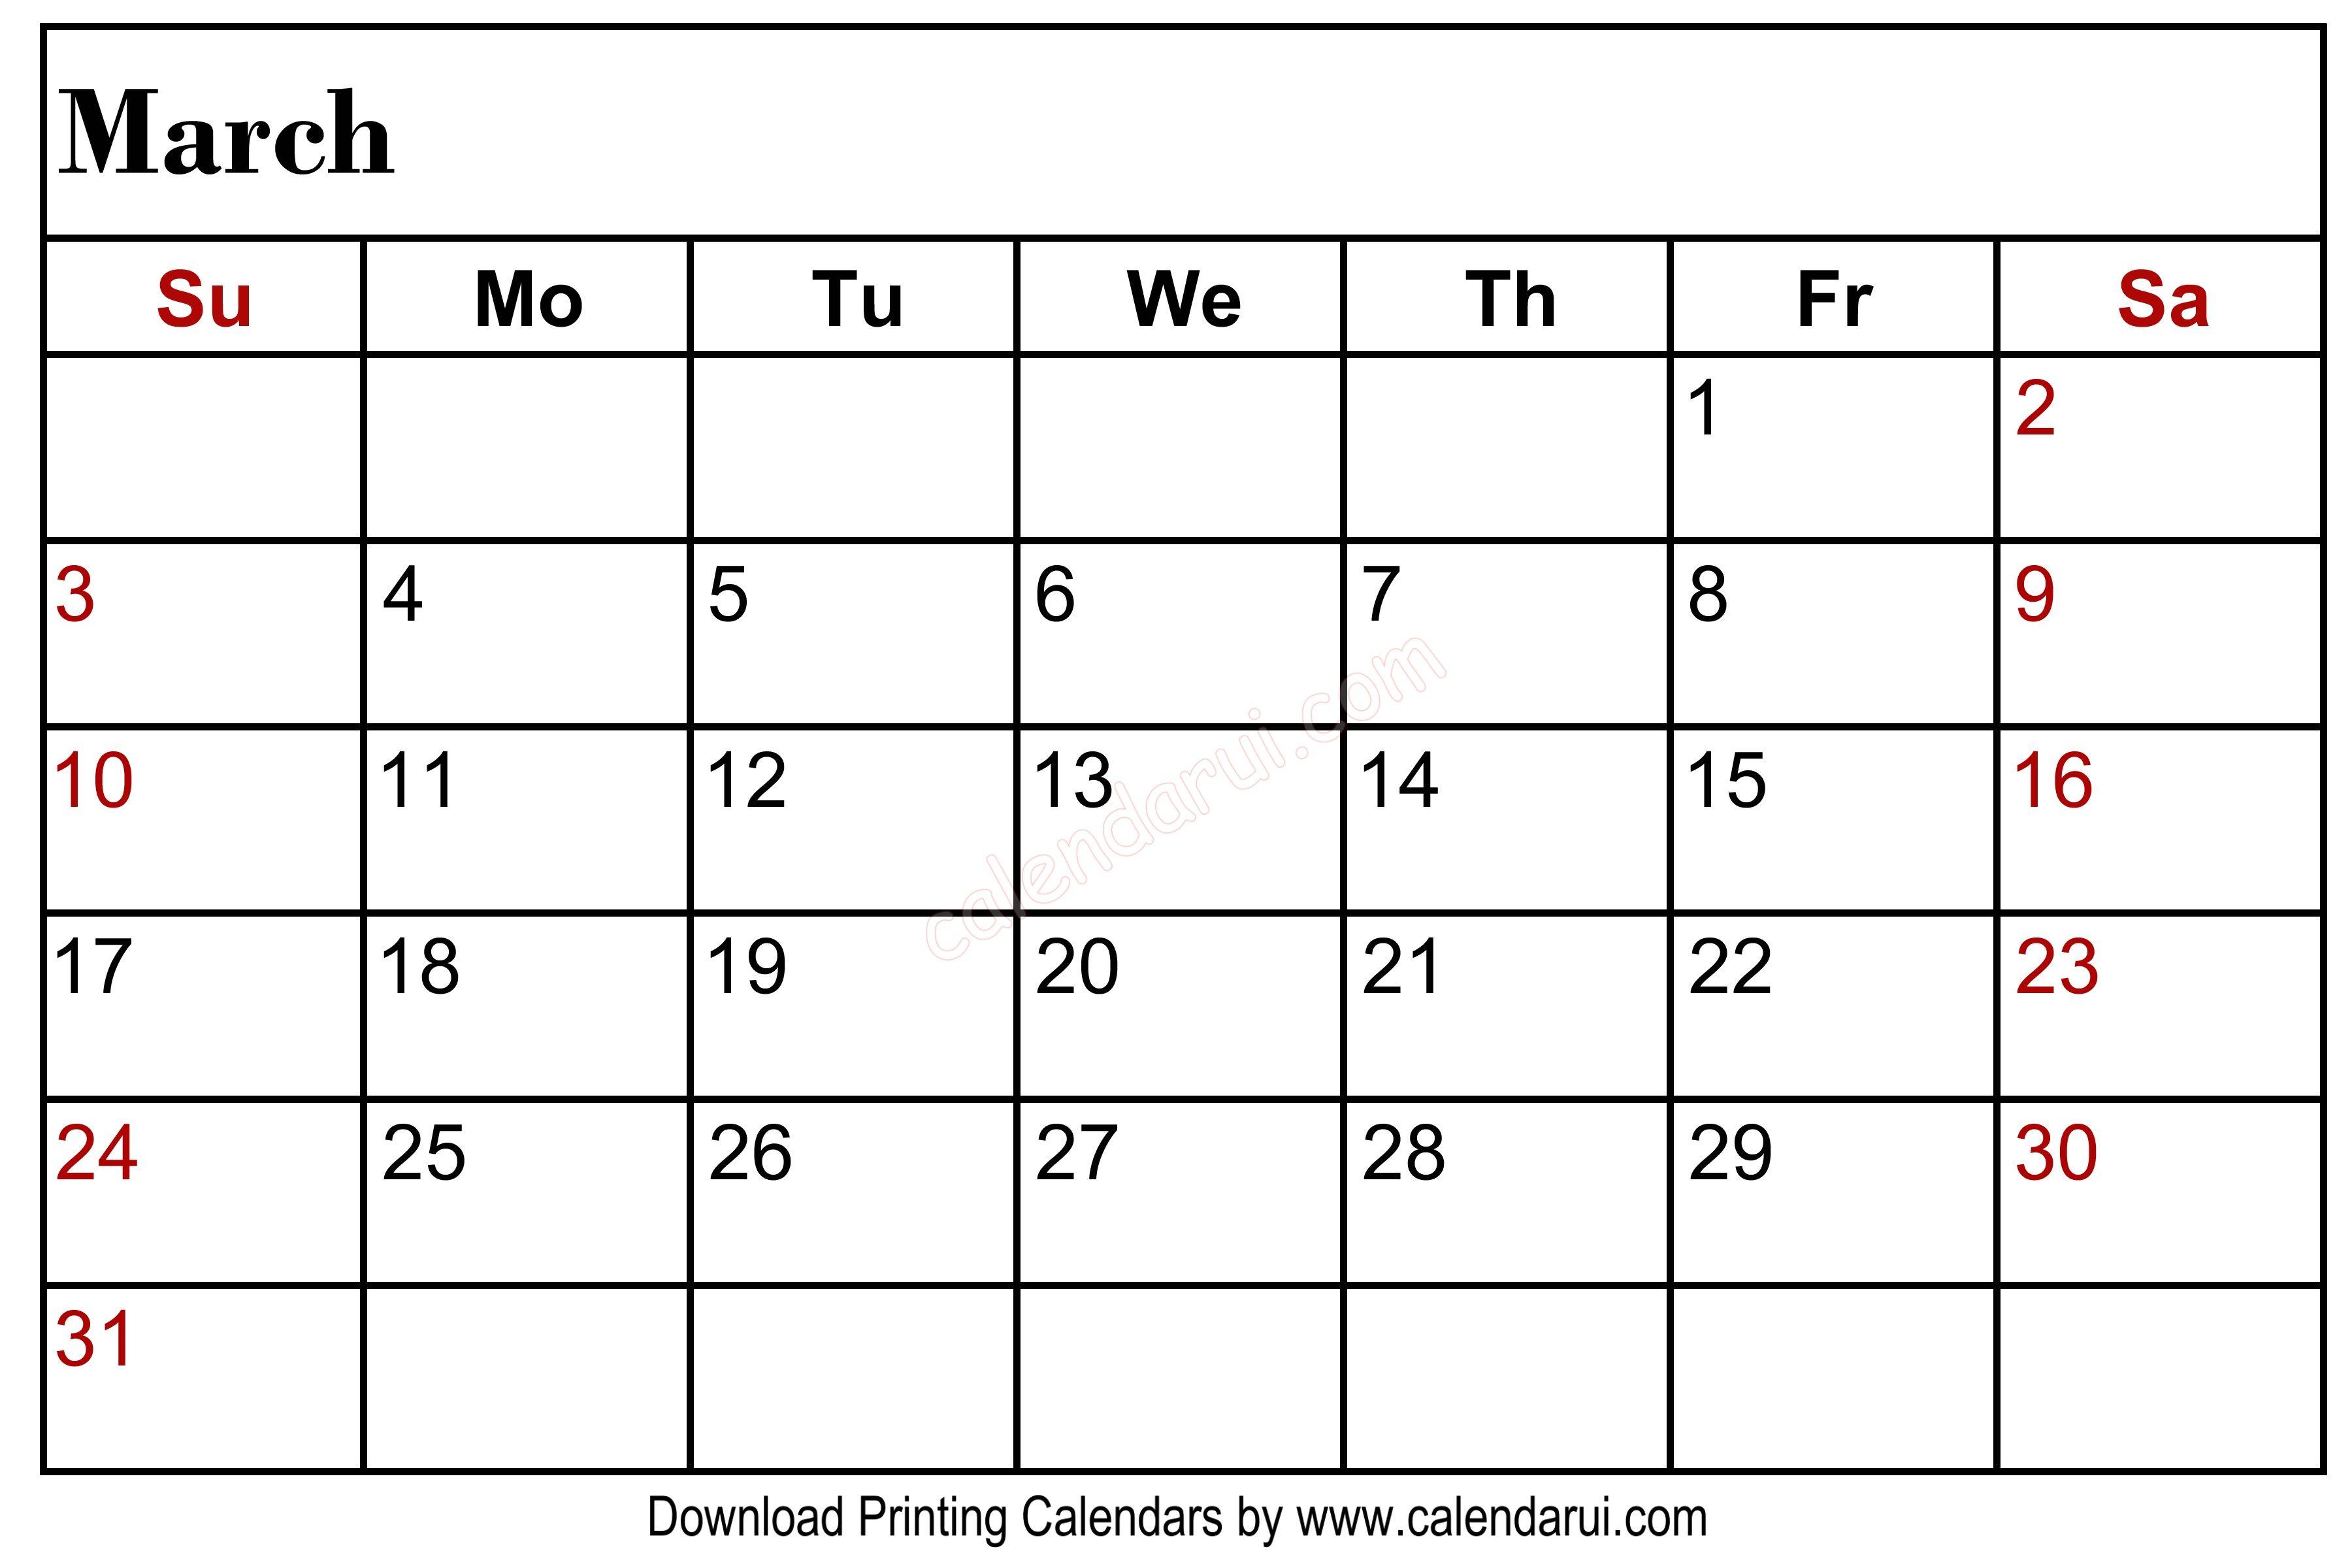 March 2020 Blank Calendar Printable Calendar Printables Holiday